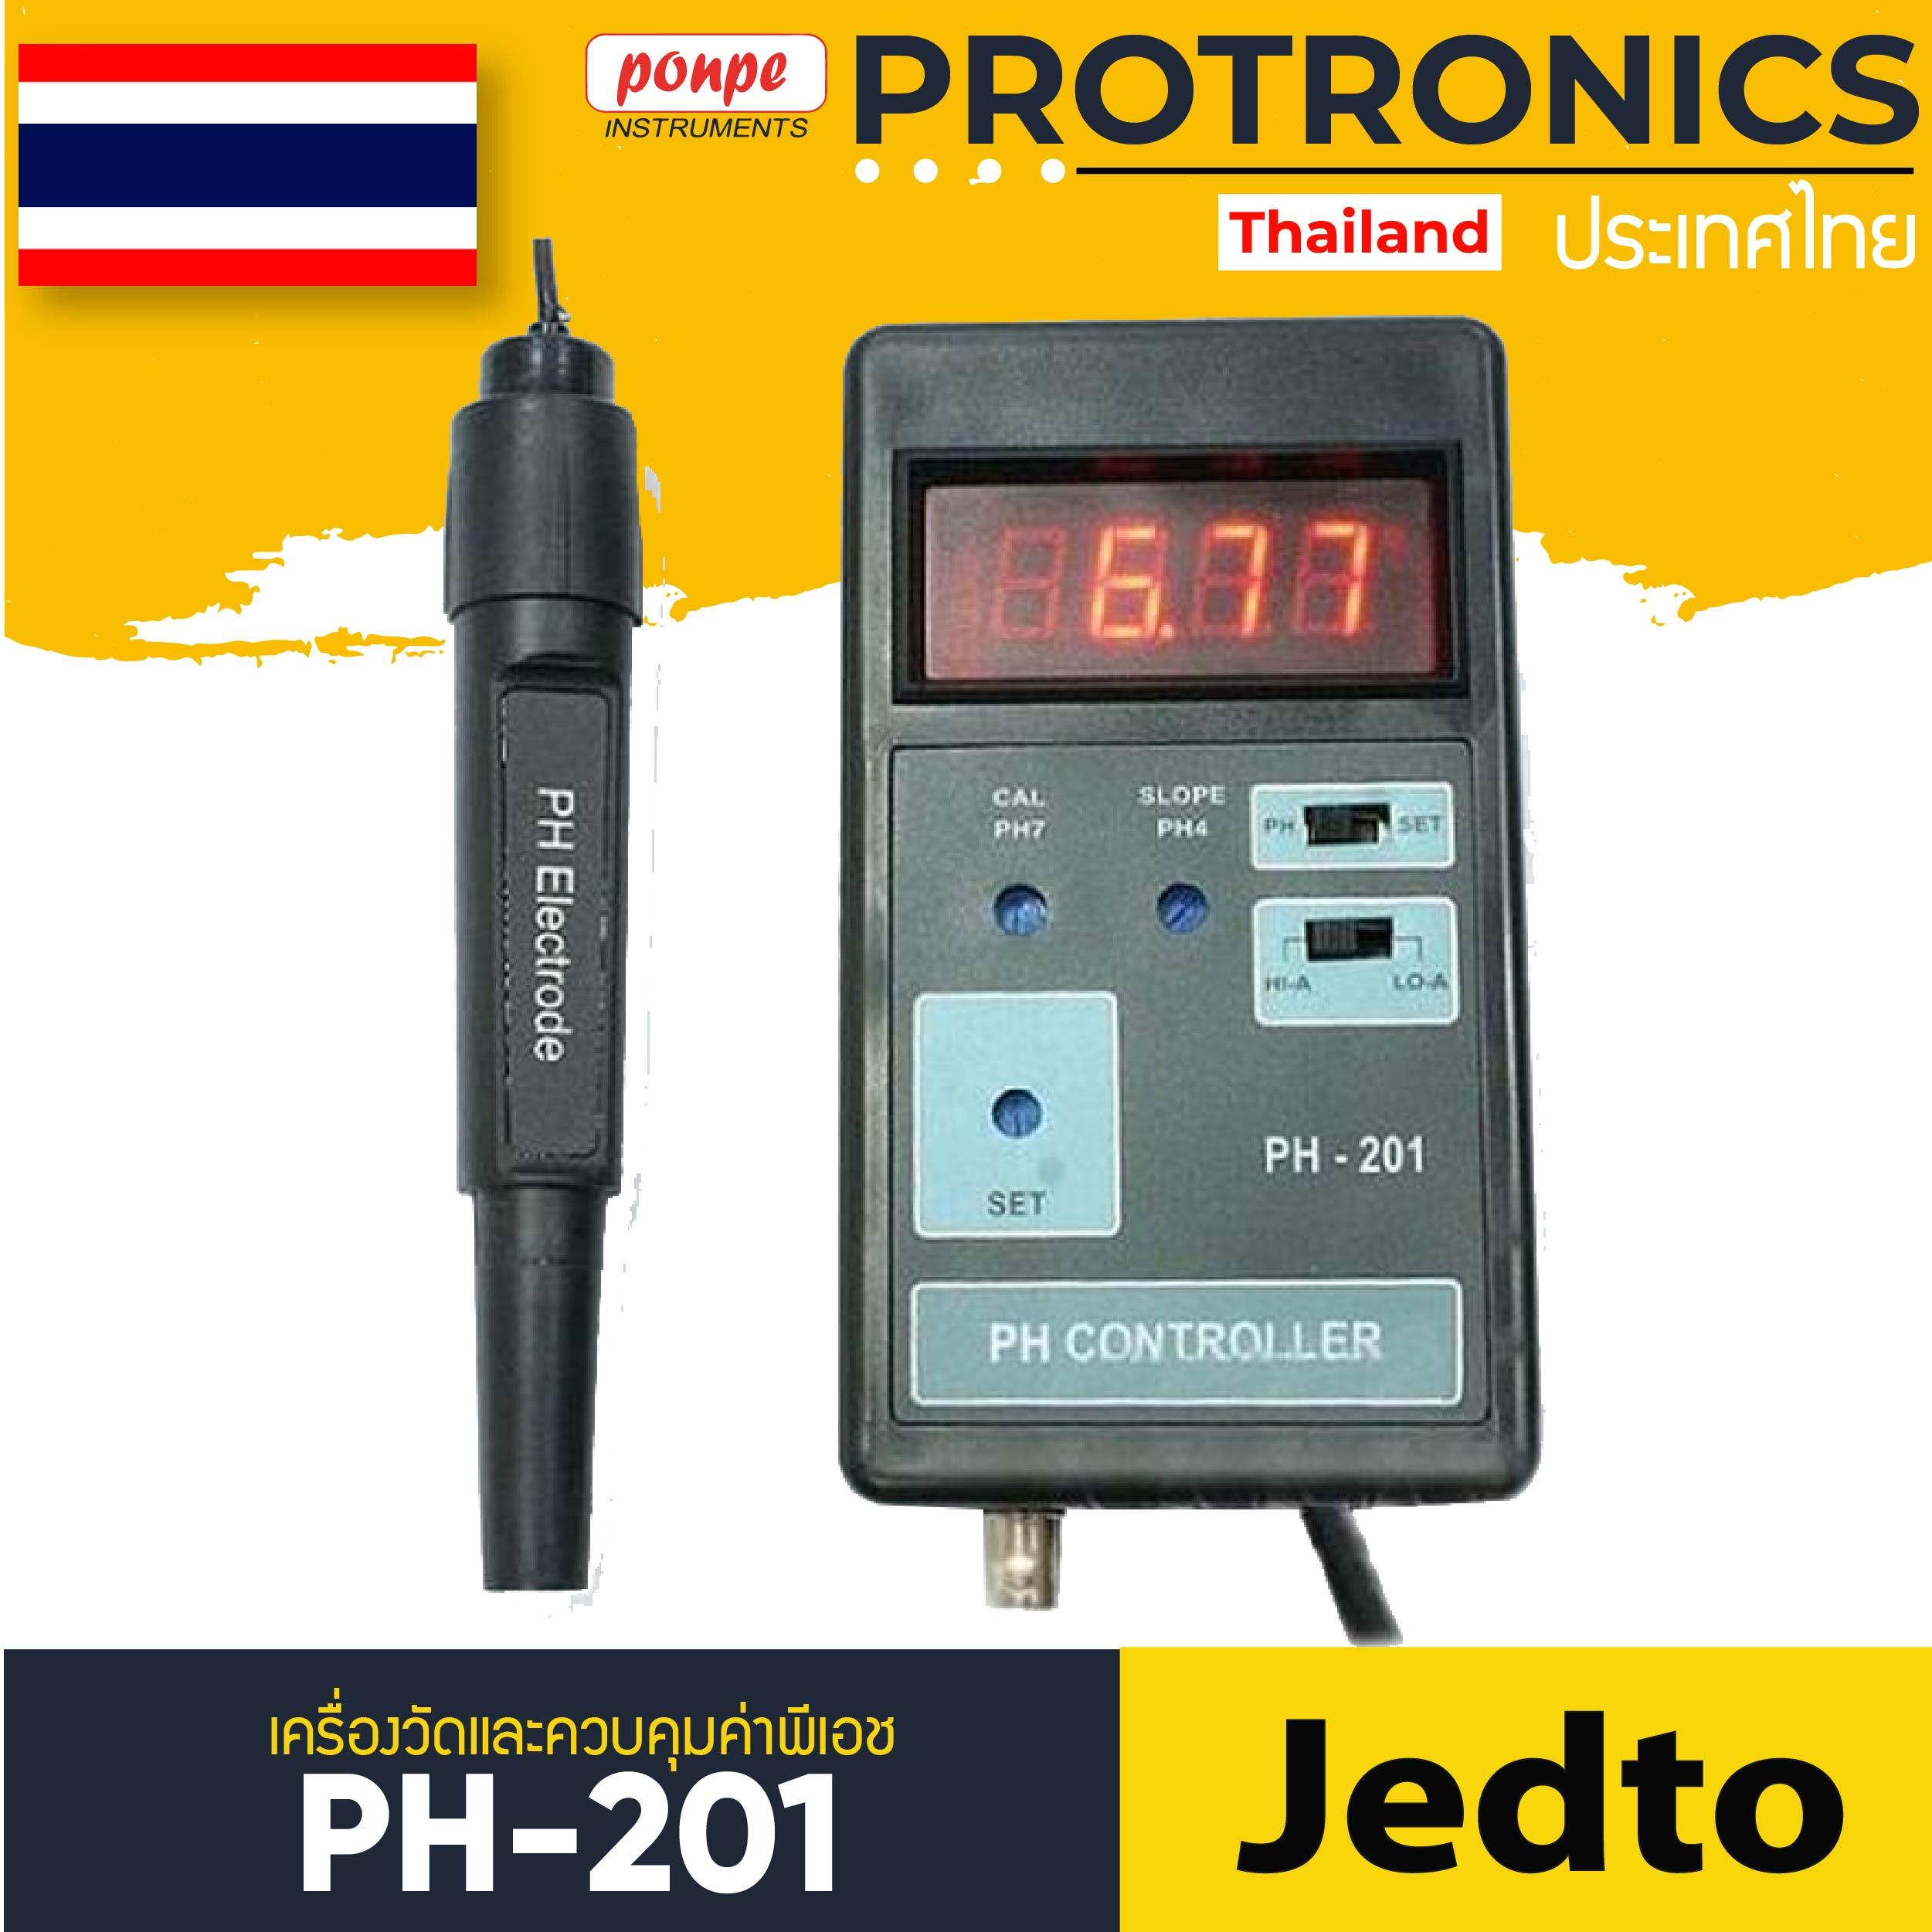 PH-201 JEDTO pH Controller Monitor Meter เครื่องวัดค่าและควบคุมค่าพีเอช